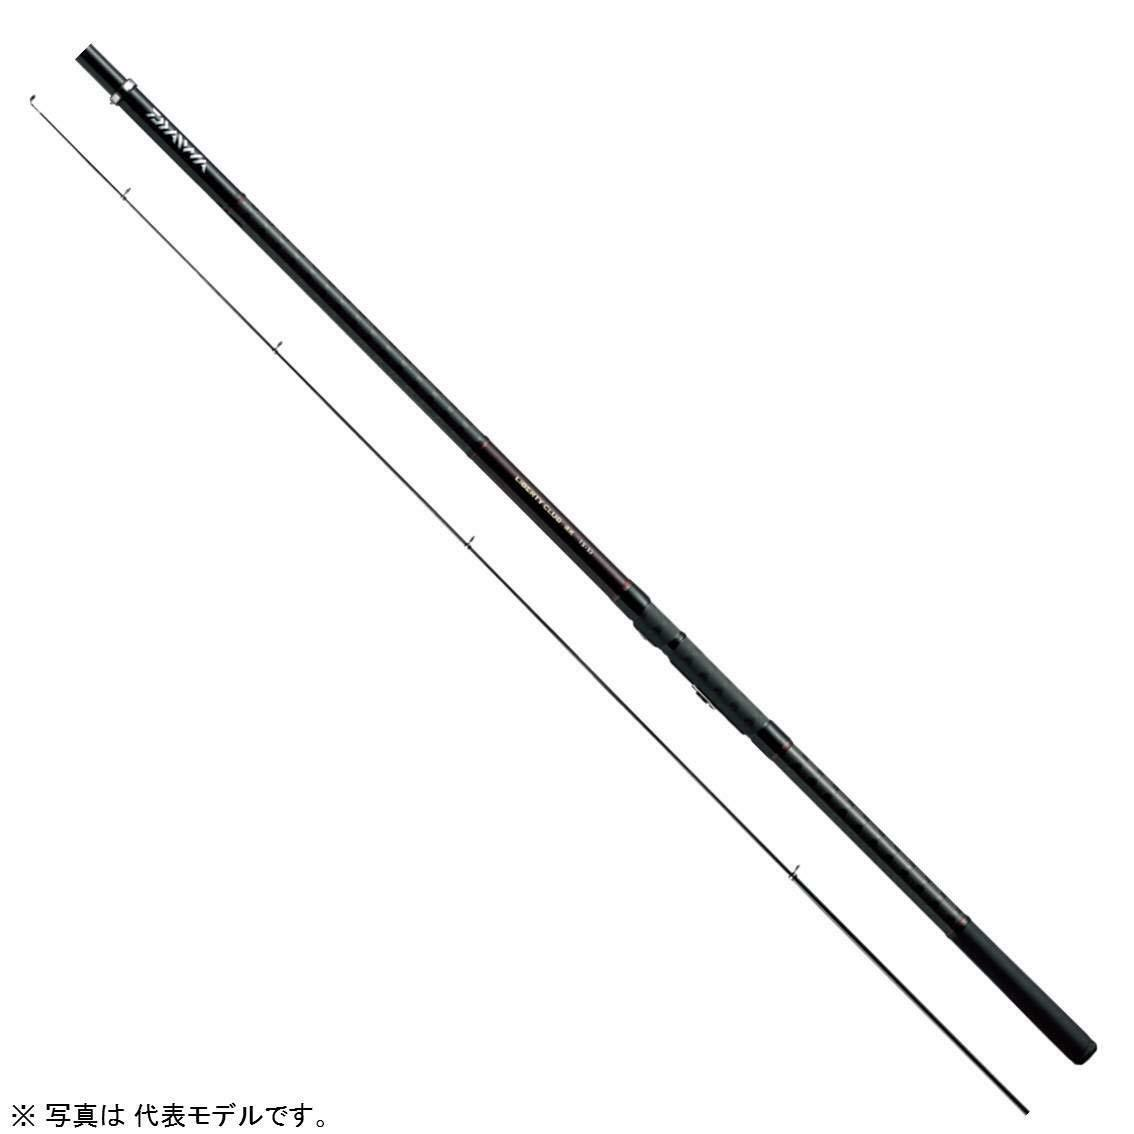 Daiwa Isoboll Spinning Liberty Club Iso Wind 1.5  45 K fishing rod NEW